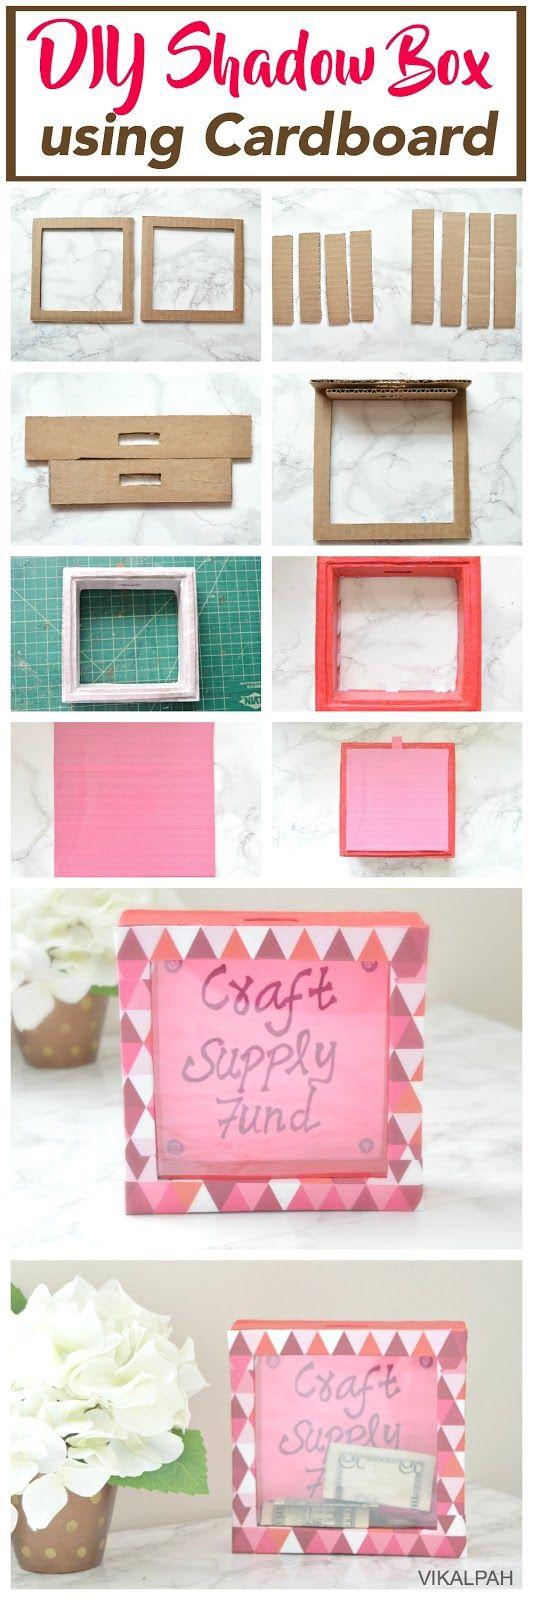 DIY Shadow box using cardboard | Vikalpah - A DIY/Crafts blog ...